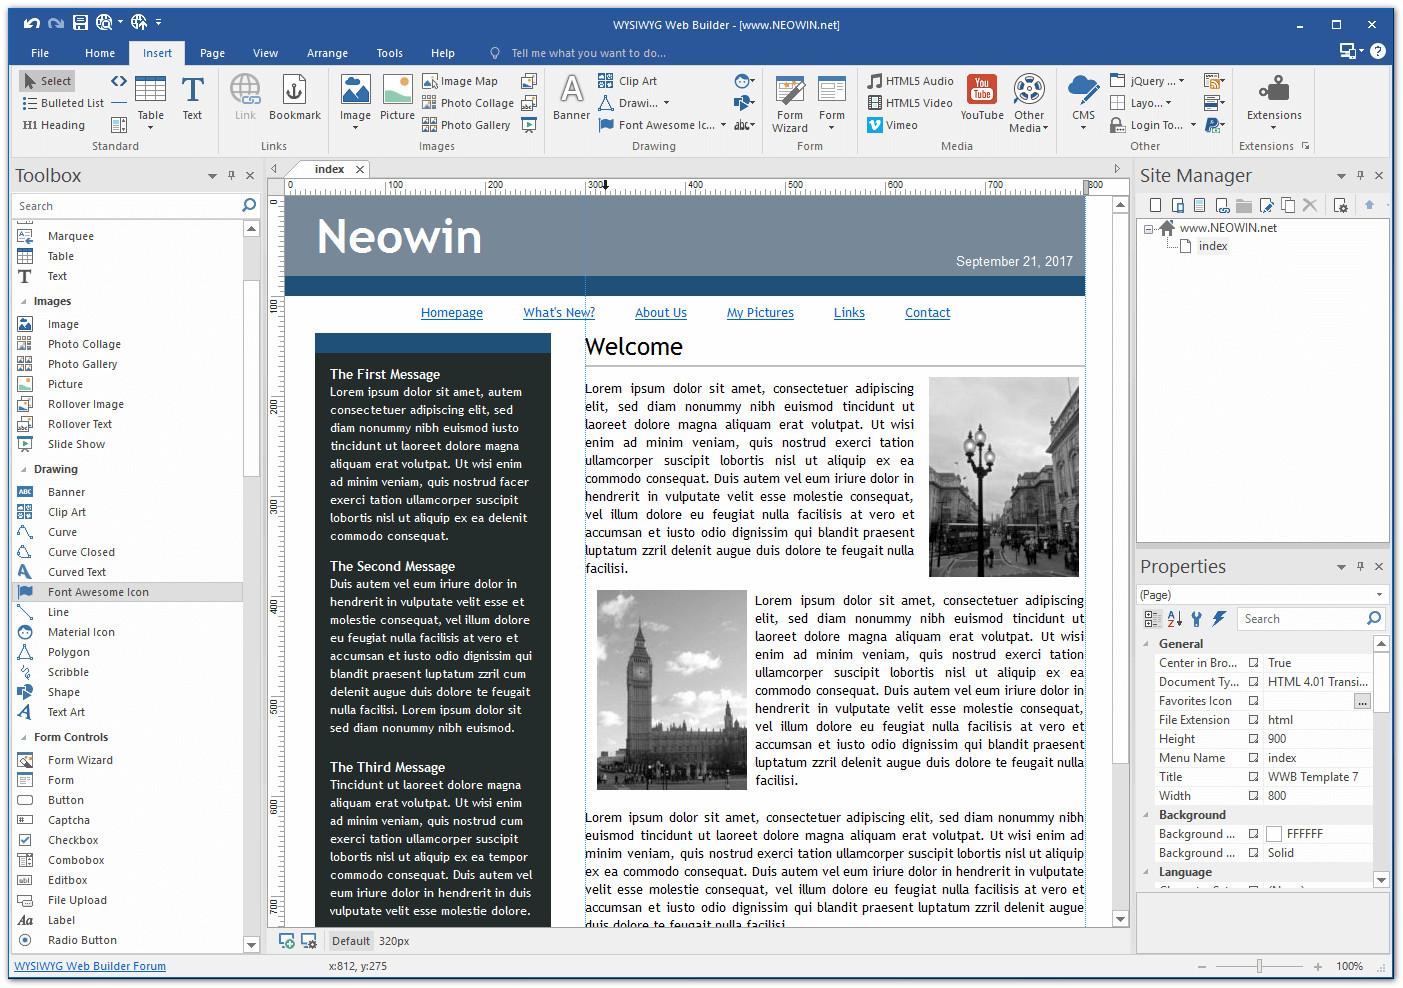 Wysiwyg Web Builder 122 Neowin